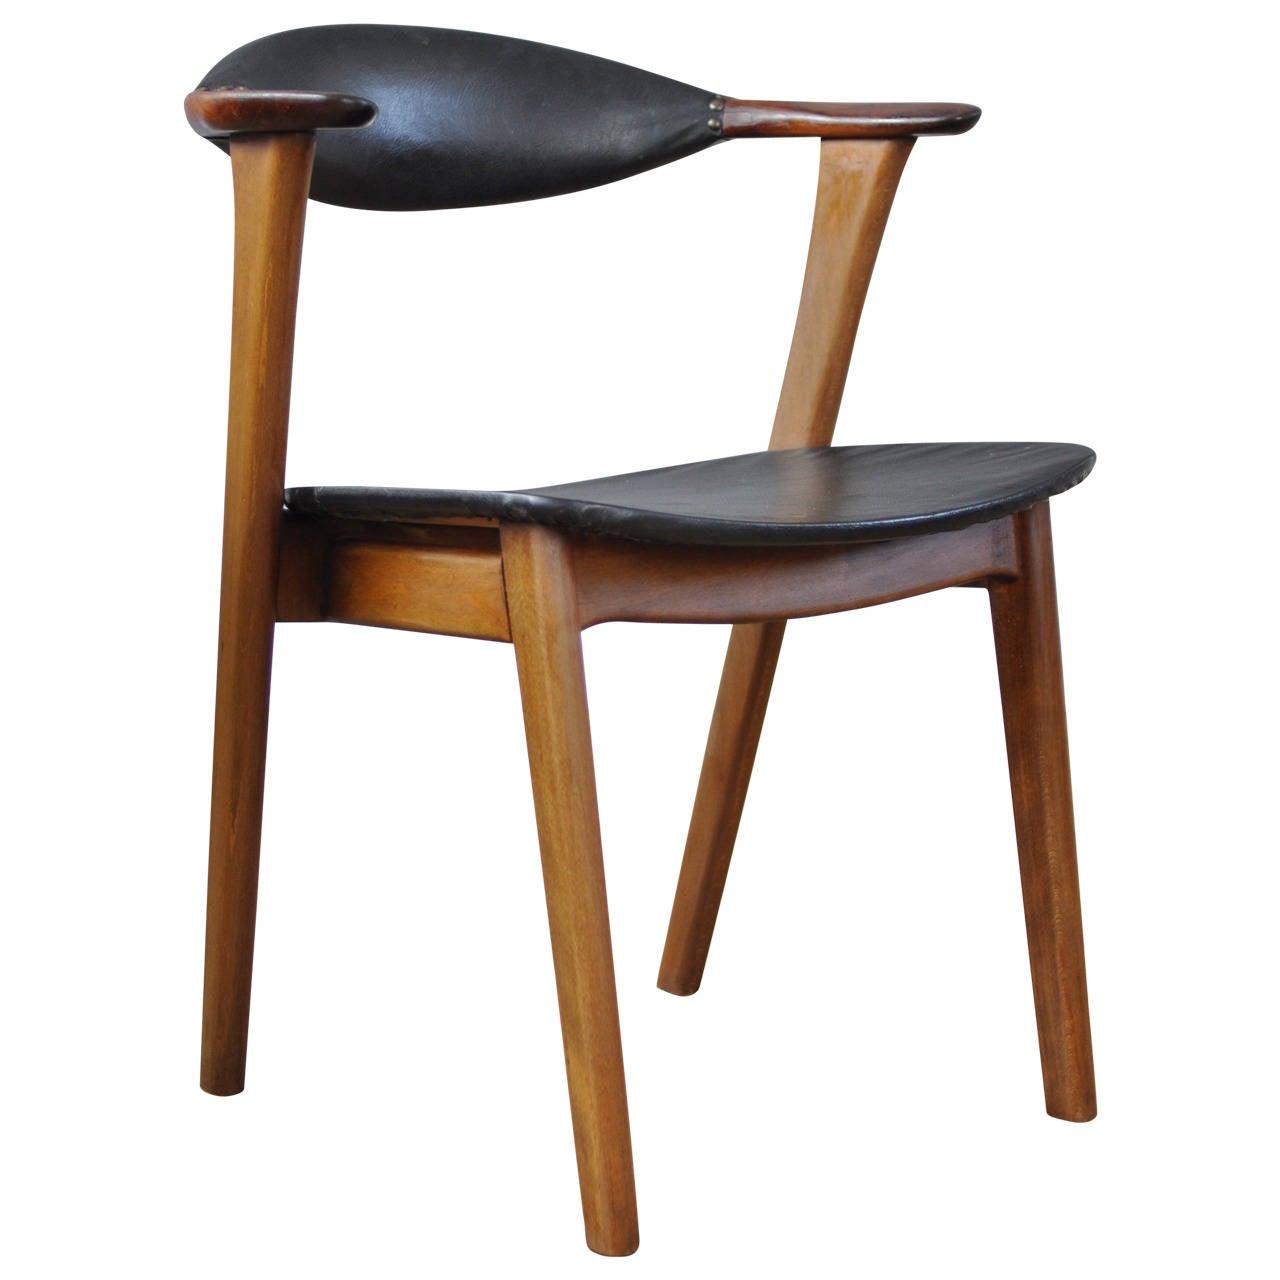 Erik Kirkegaard Danish Modern Occasional Chair at 1stdibs